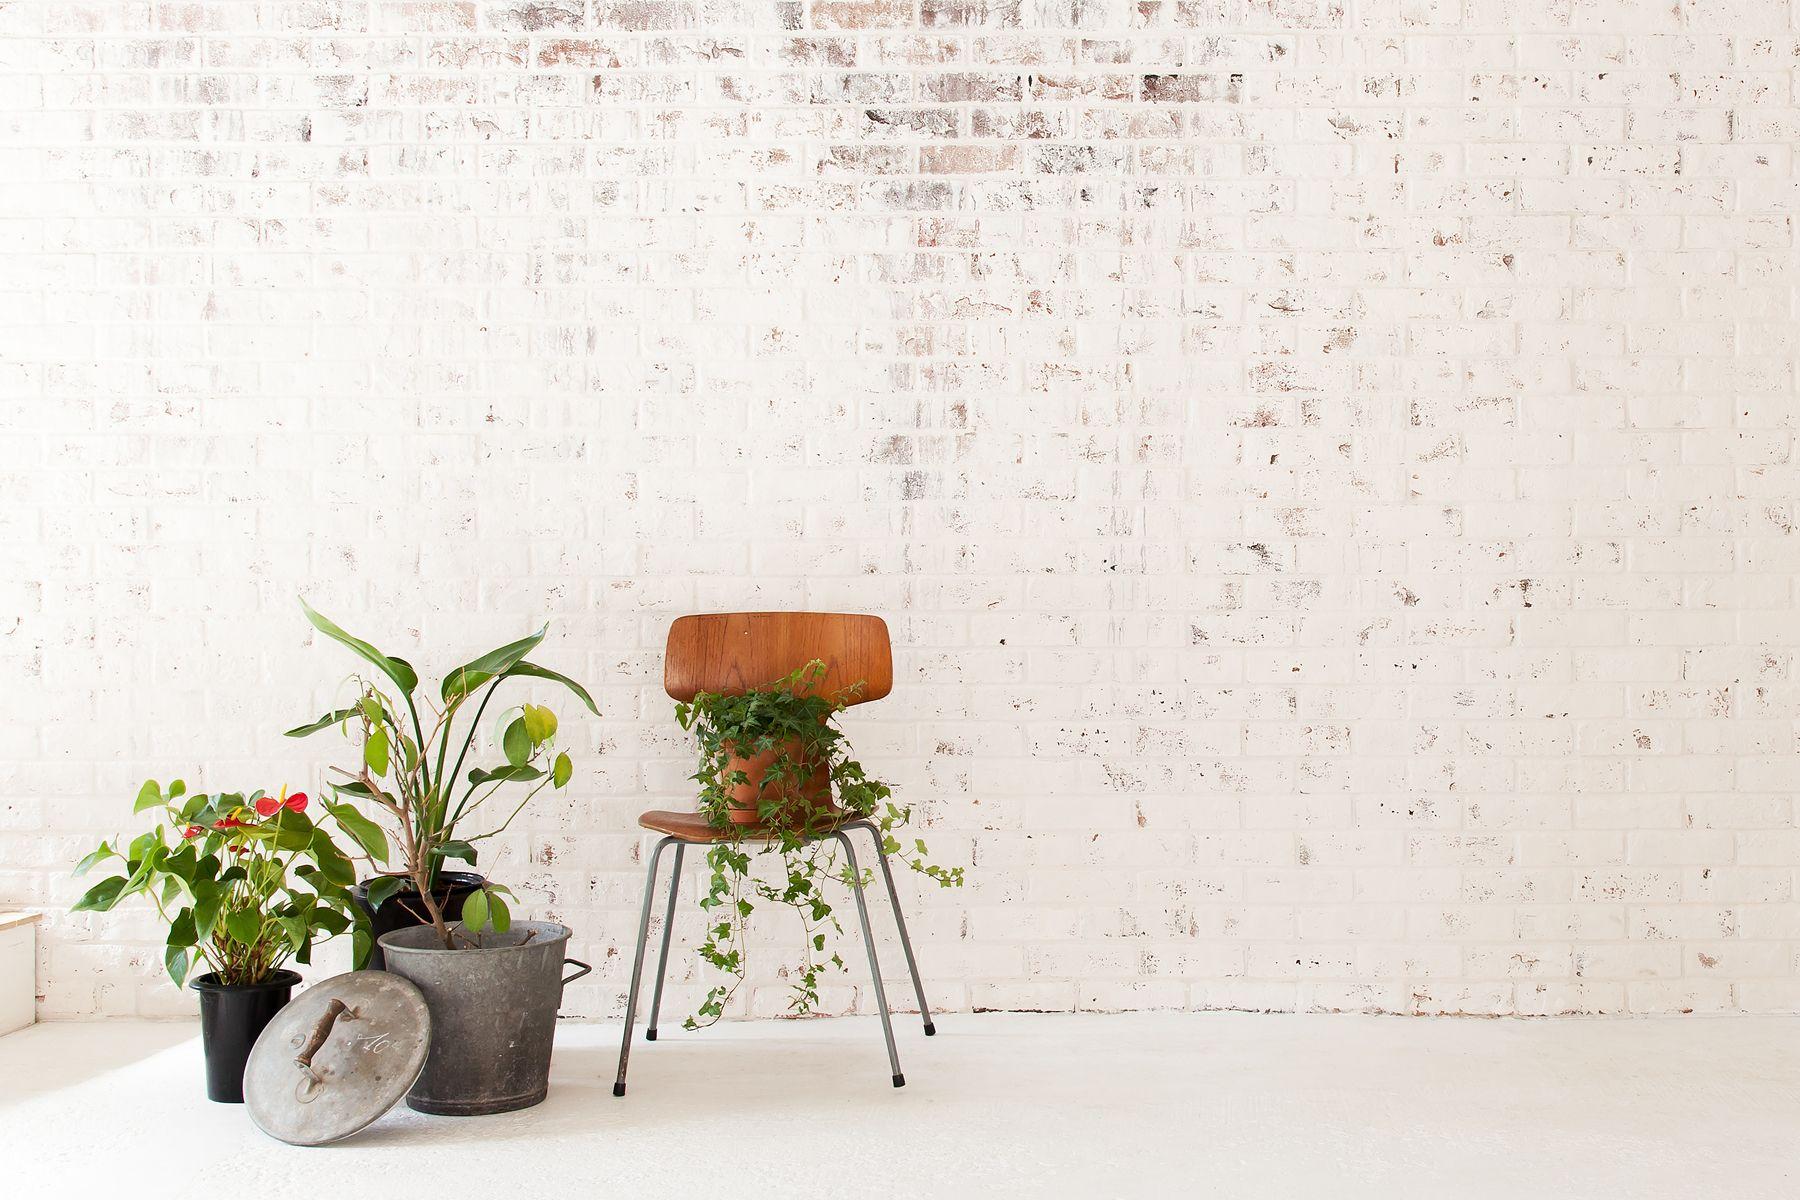 debolbe Studio&Warehouse (ディボルブ スタジオ)風合い豊かな白いレンガ壁